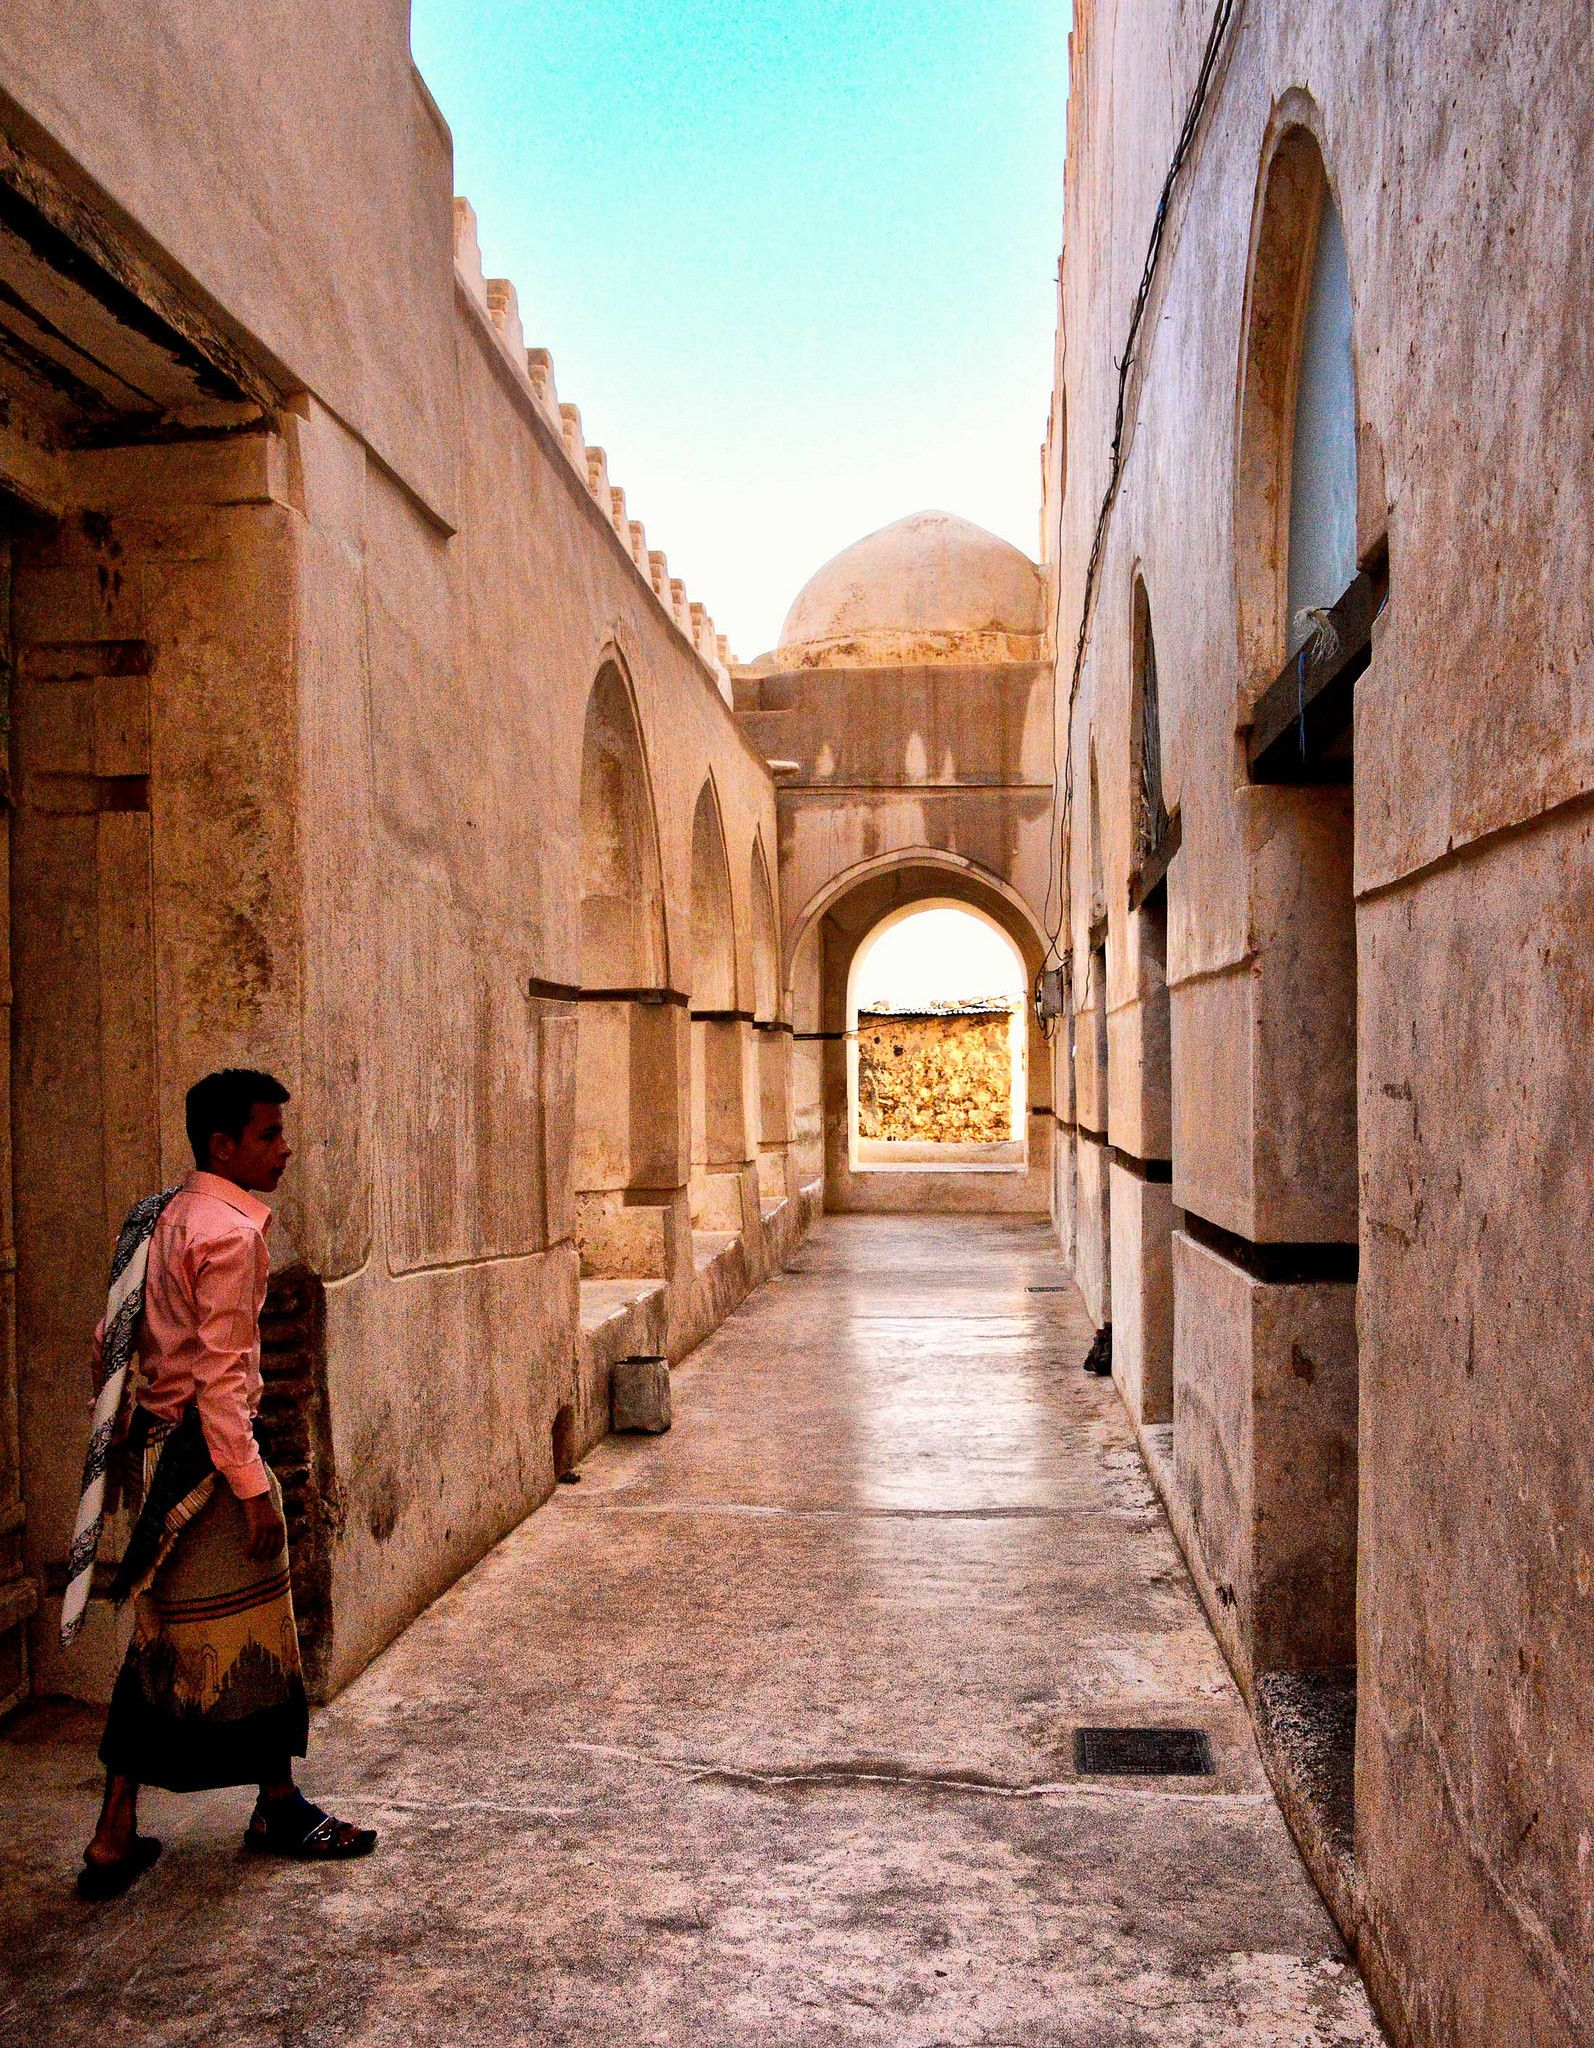 Taiz, Yemen // ©Rod Waddington // Creative Commons